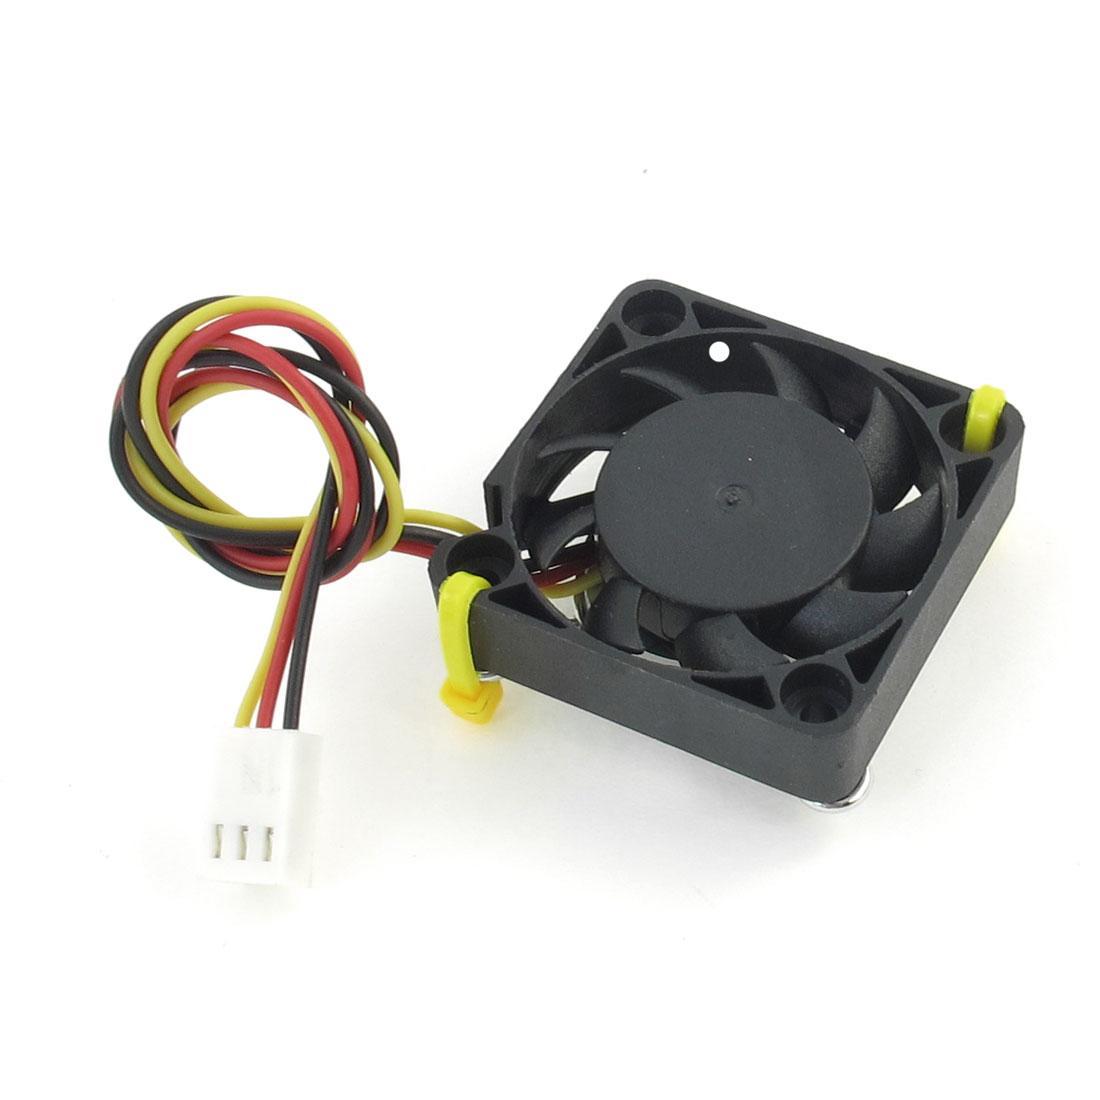 DC 12V 0.1A 3-Terminal PC Case CPU Cooler Cooling Fan 40mm x 40mm x 10mm